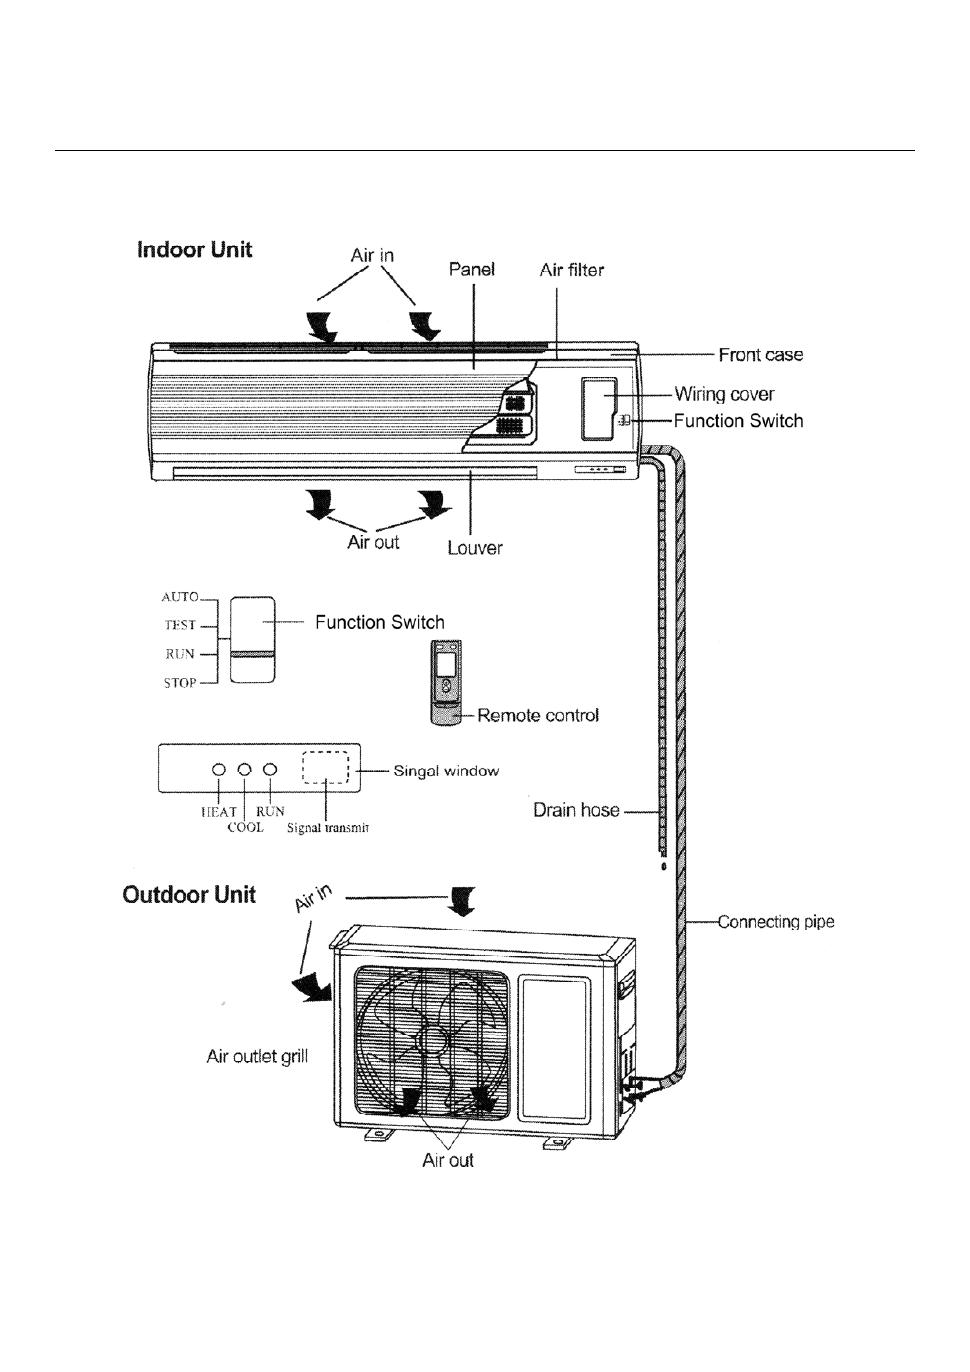 [QNCB_7524]  Split Ac Unit Wiring - 94 Toyota Pickup Fuel Filter for Wiring Diagram  Schematics | Ac Mini Split System Wiring Diagram |  | Wiring Diagram Schematics